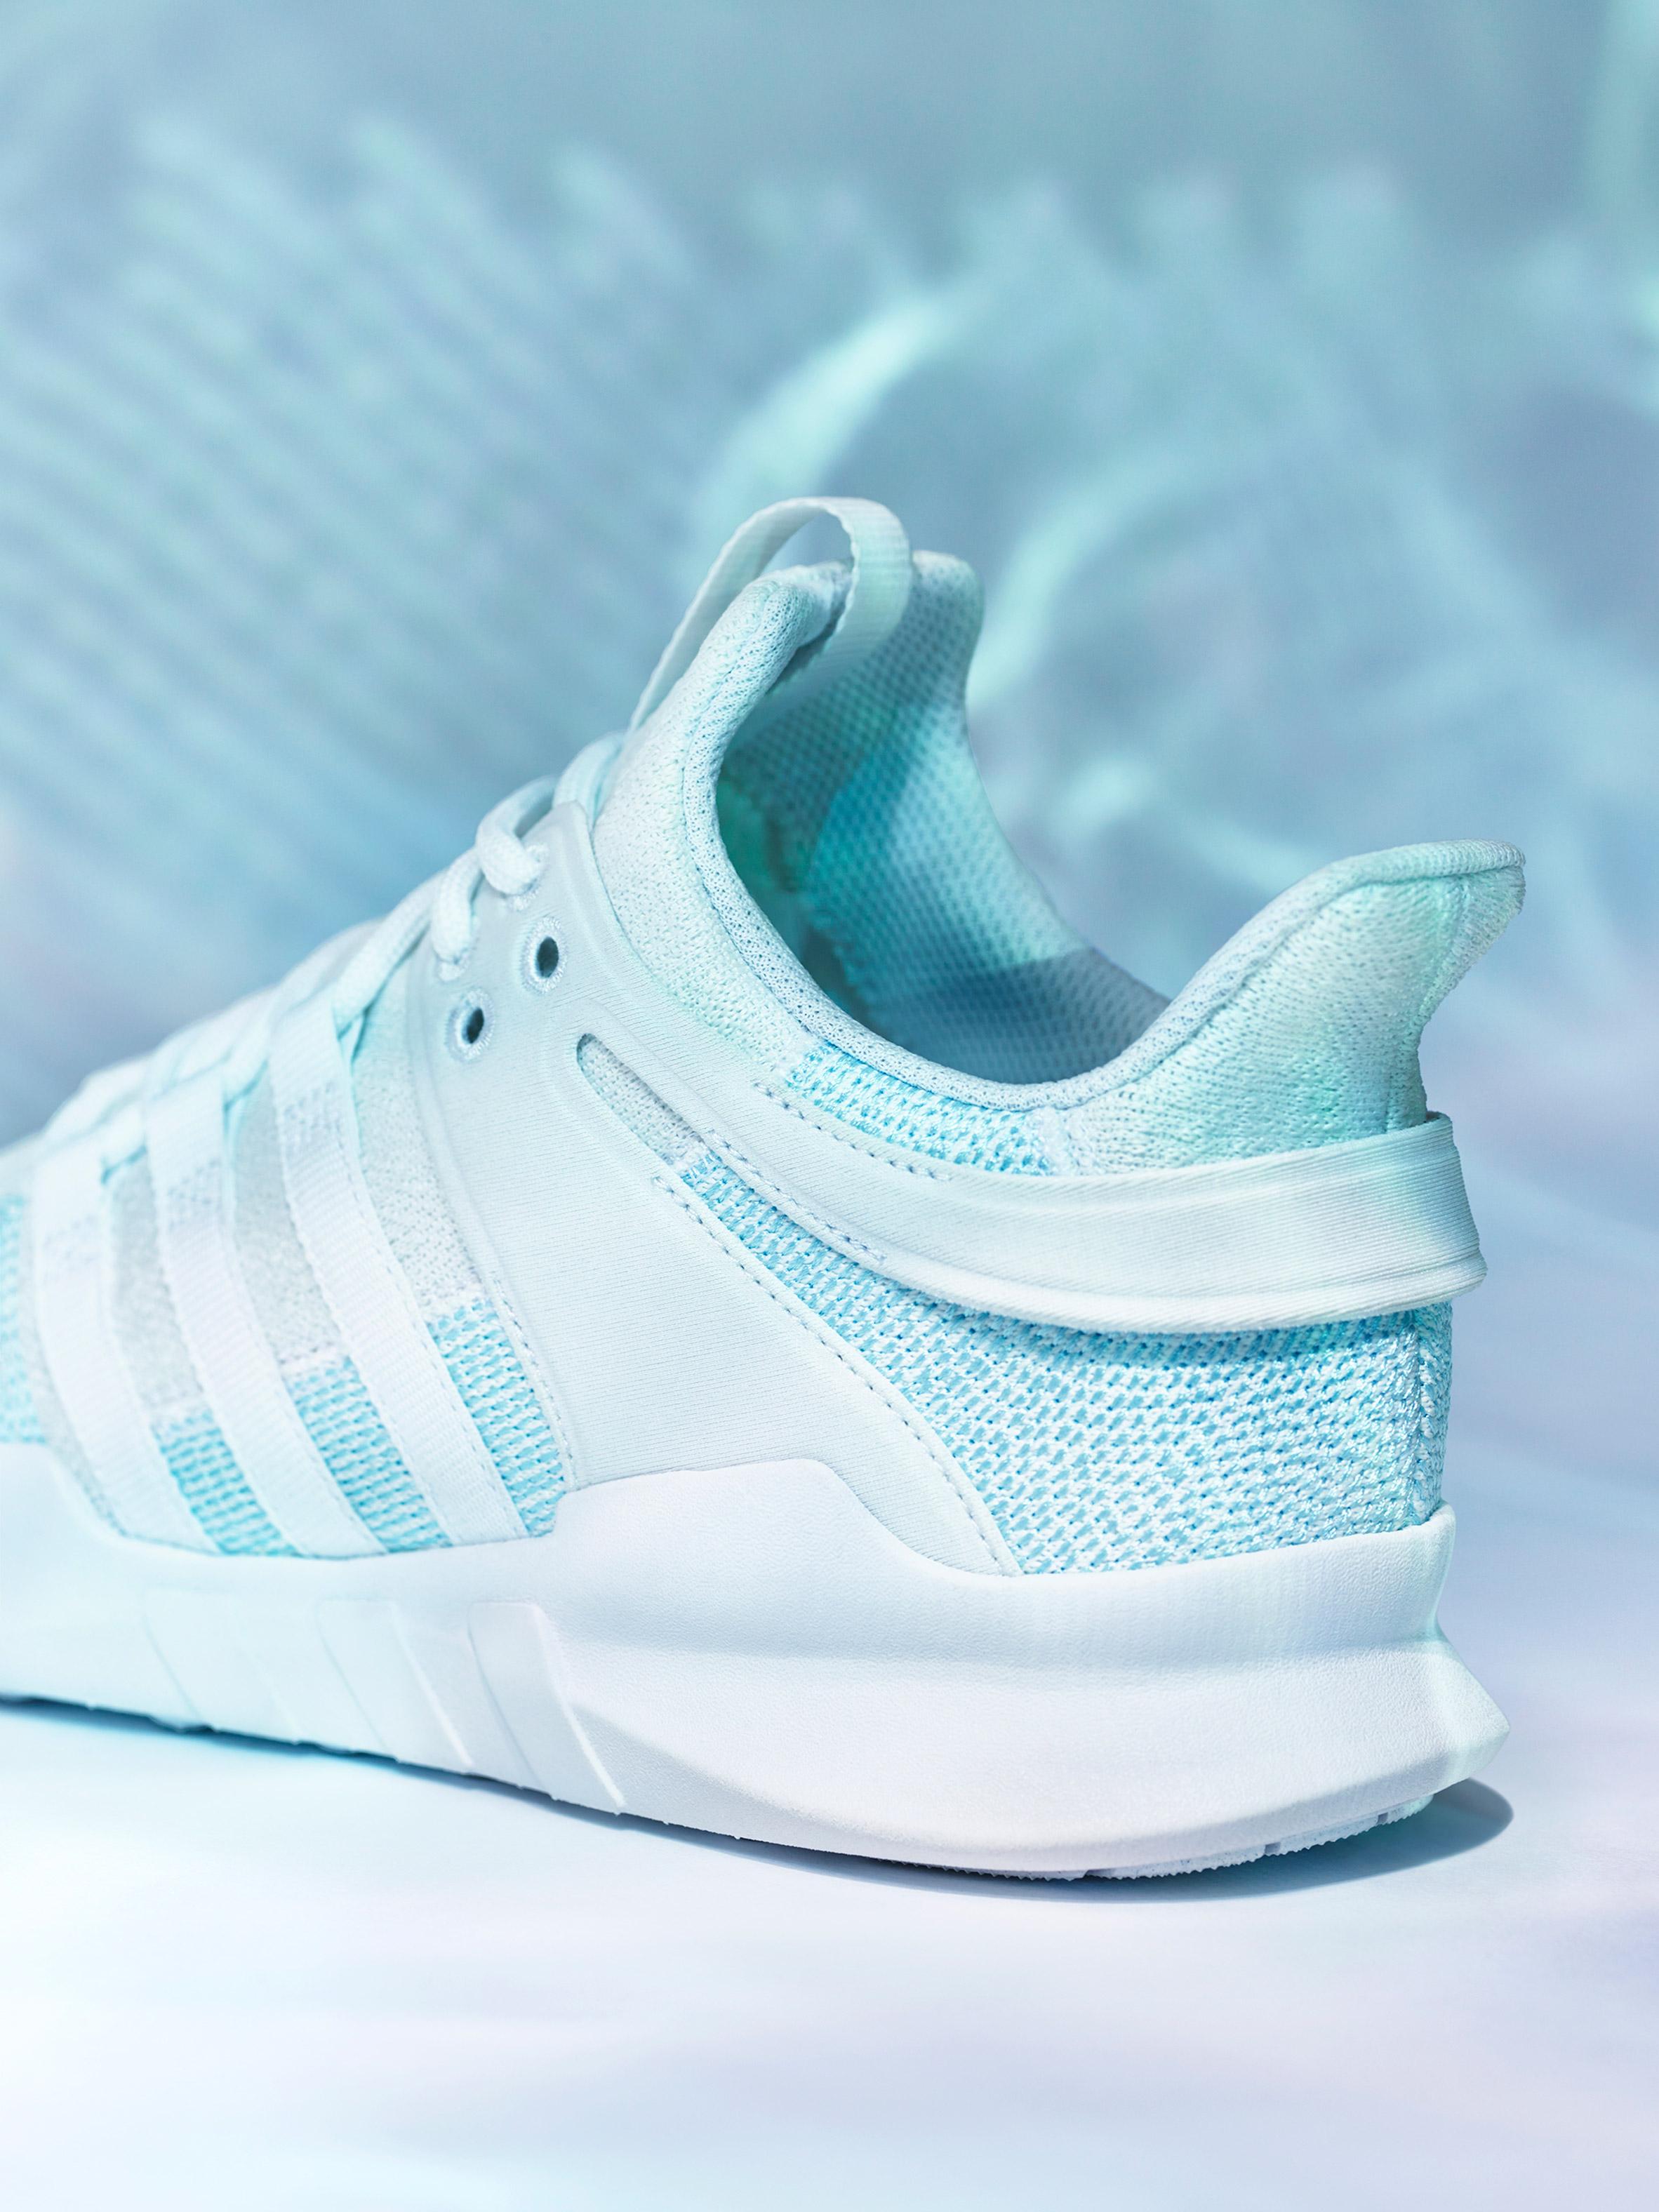 HD Adidas Originals Parley Ocean Plastic Trainers Photos